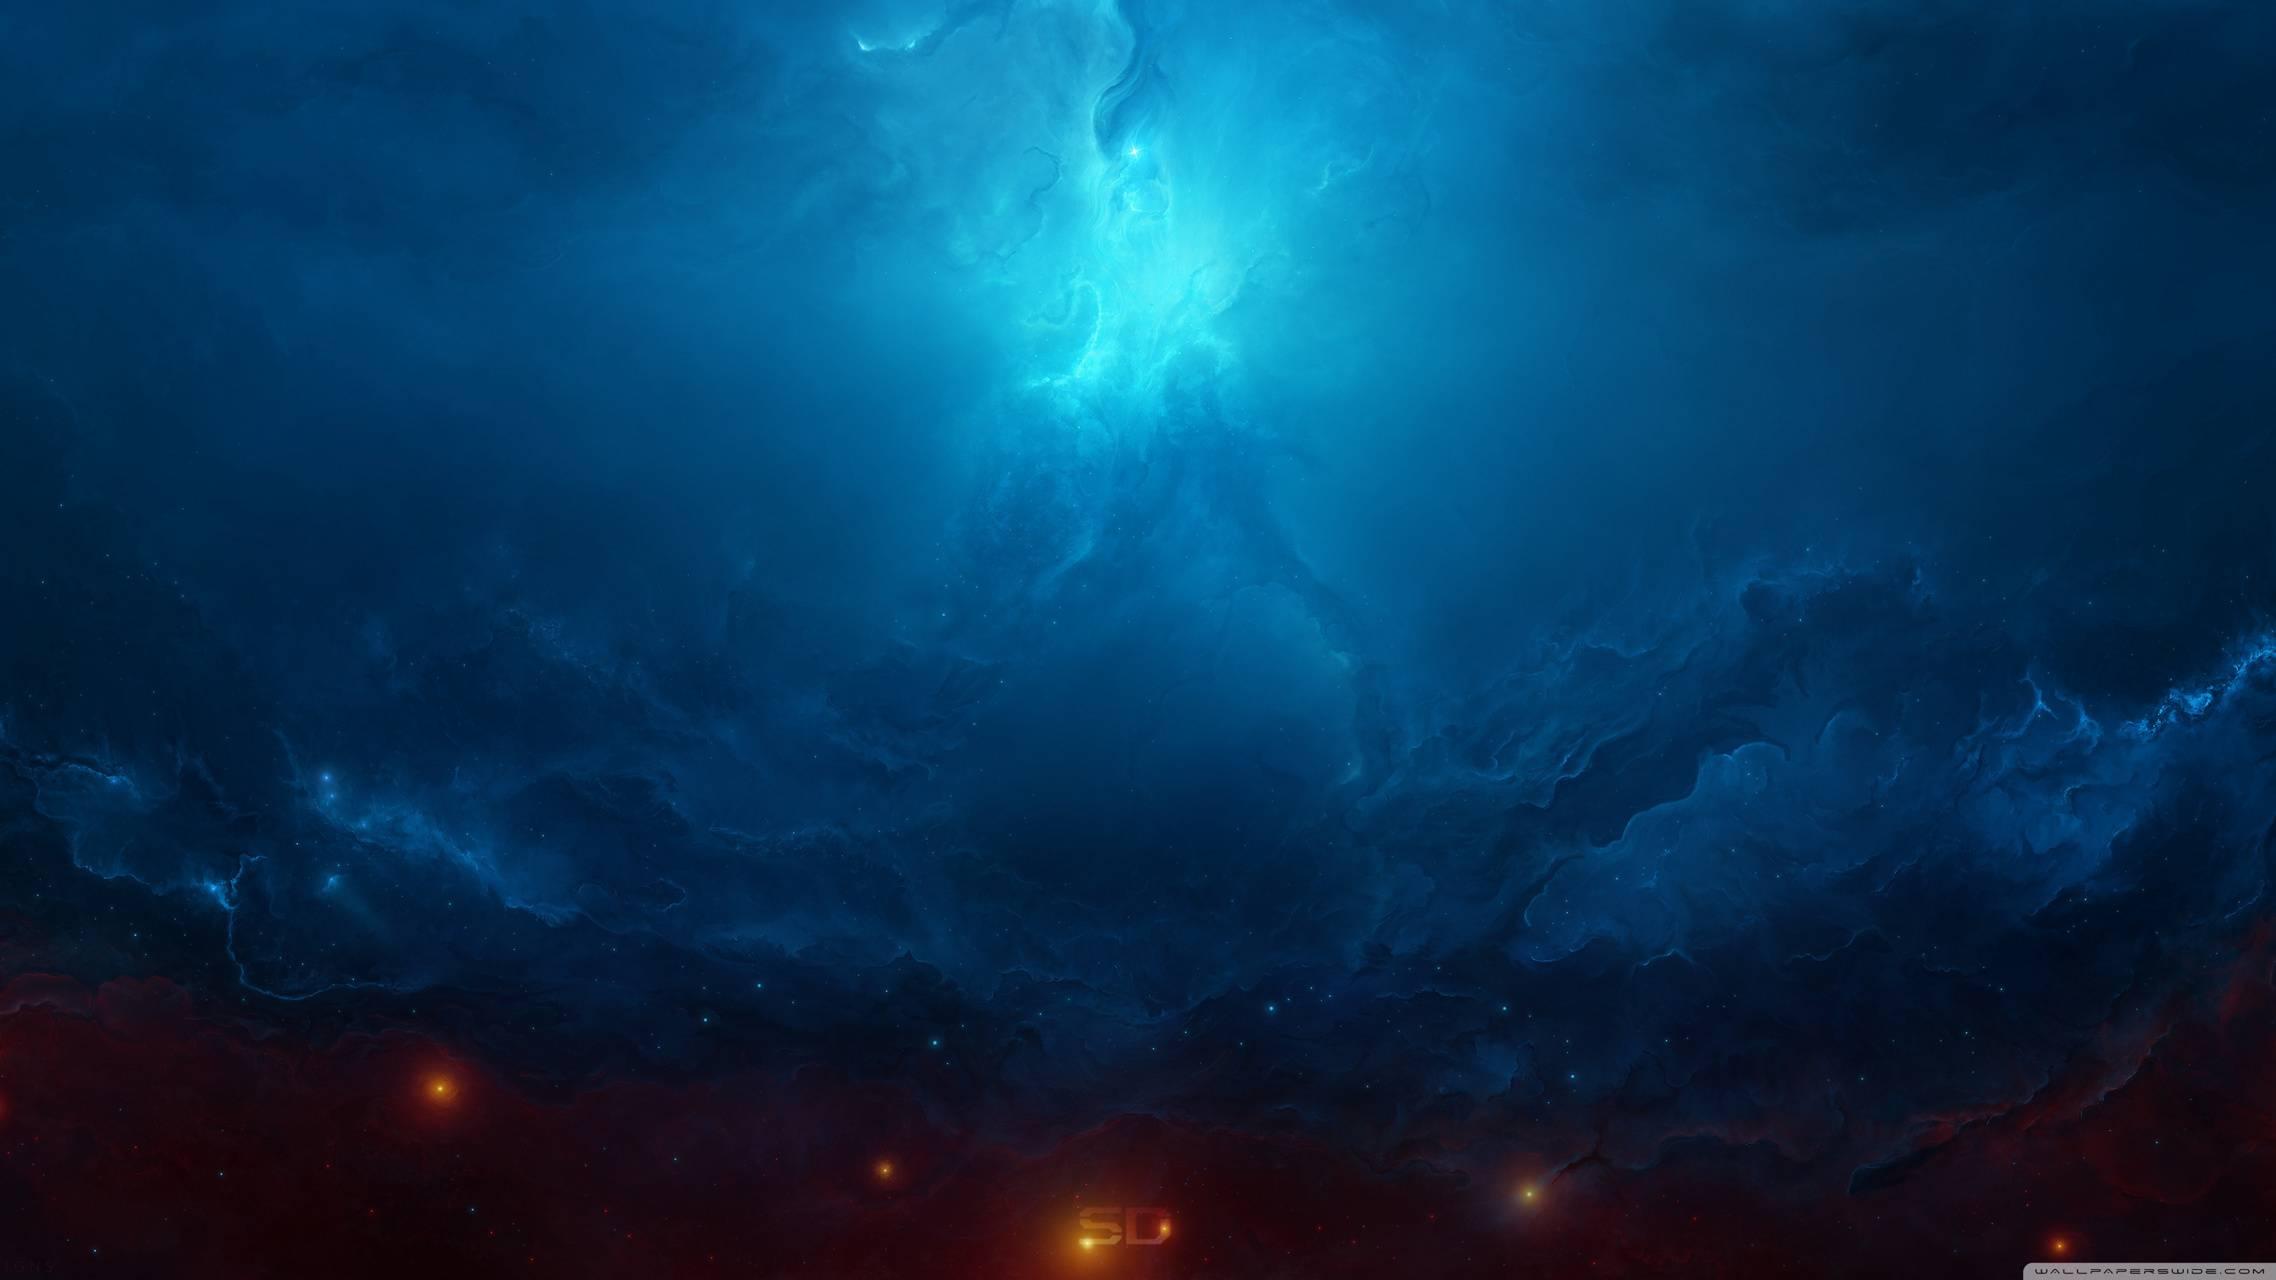 Arch Nebula